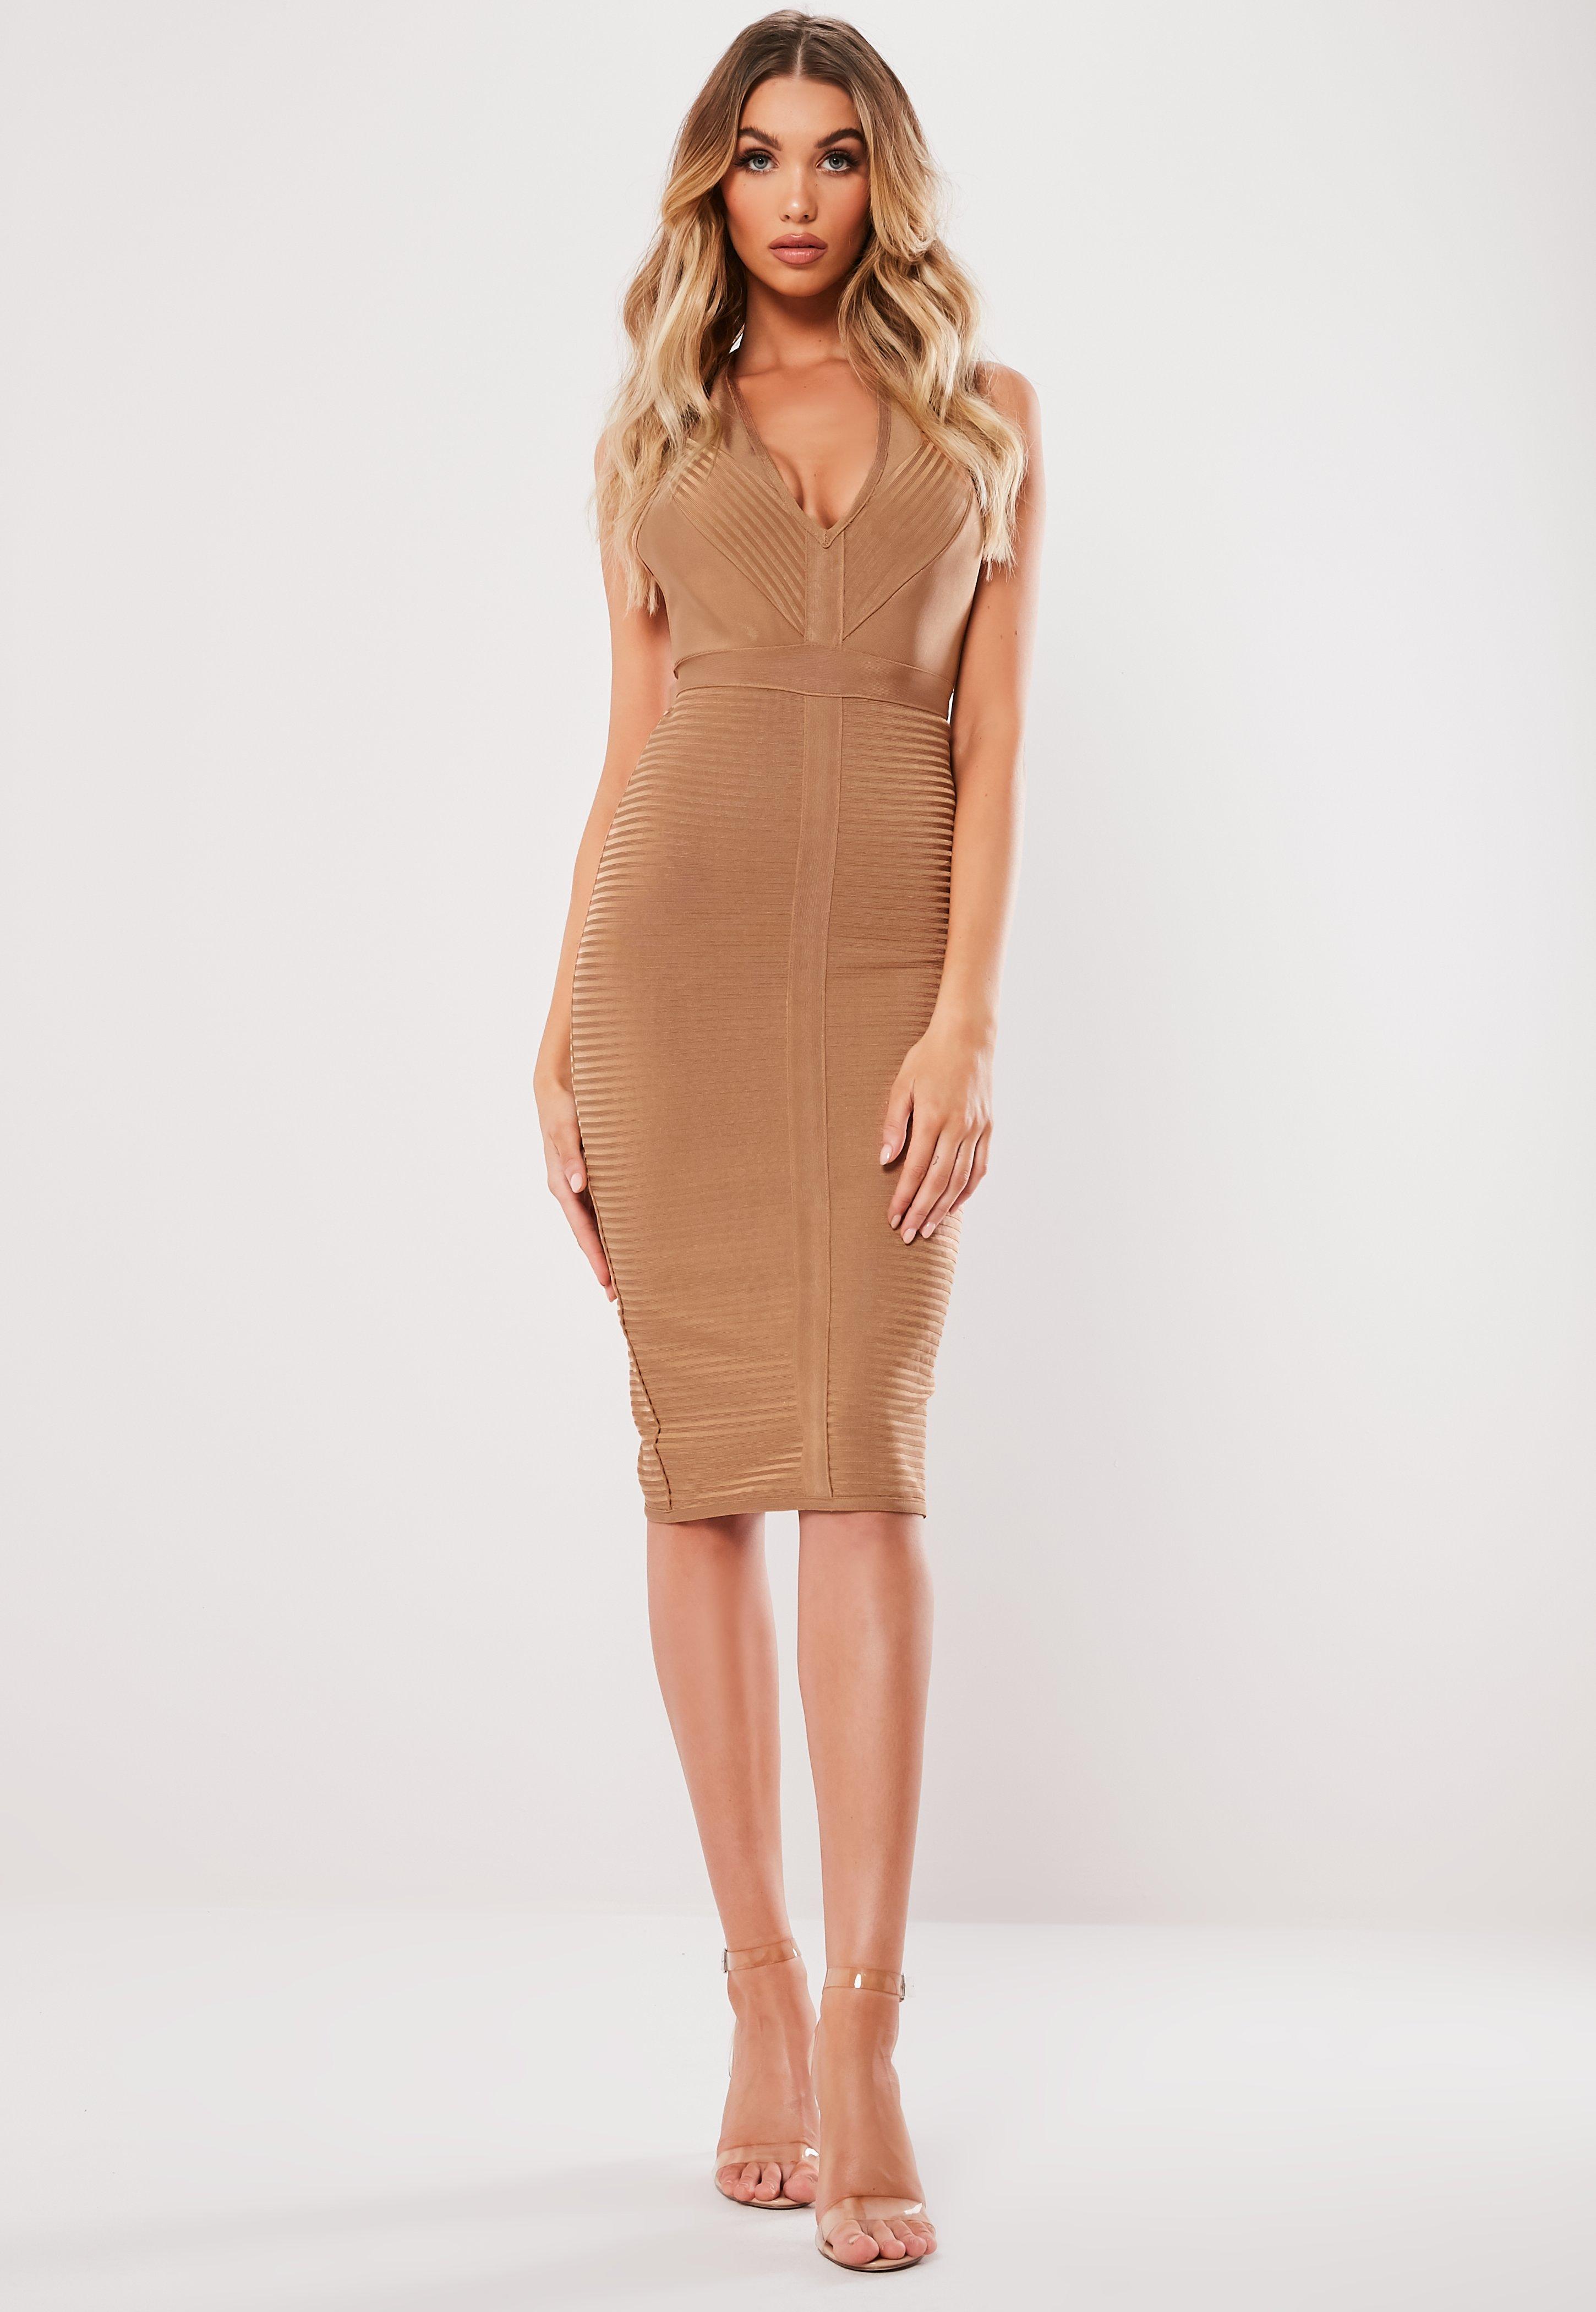 7b8d7425a1 Midi Dresses